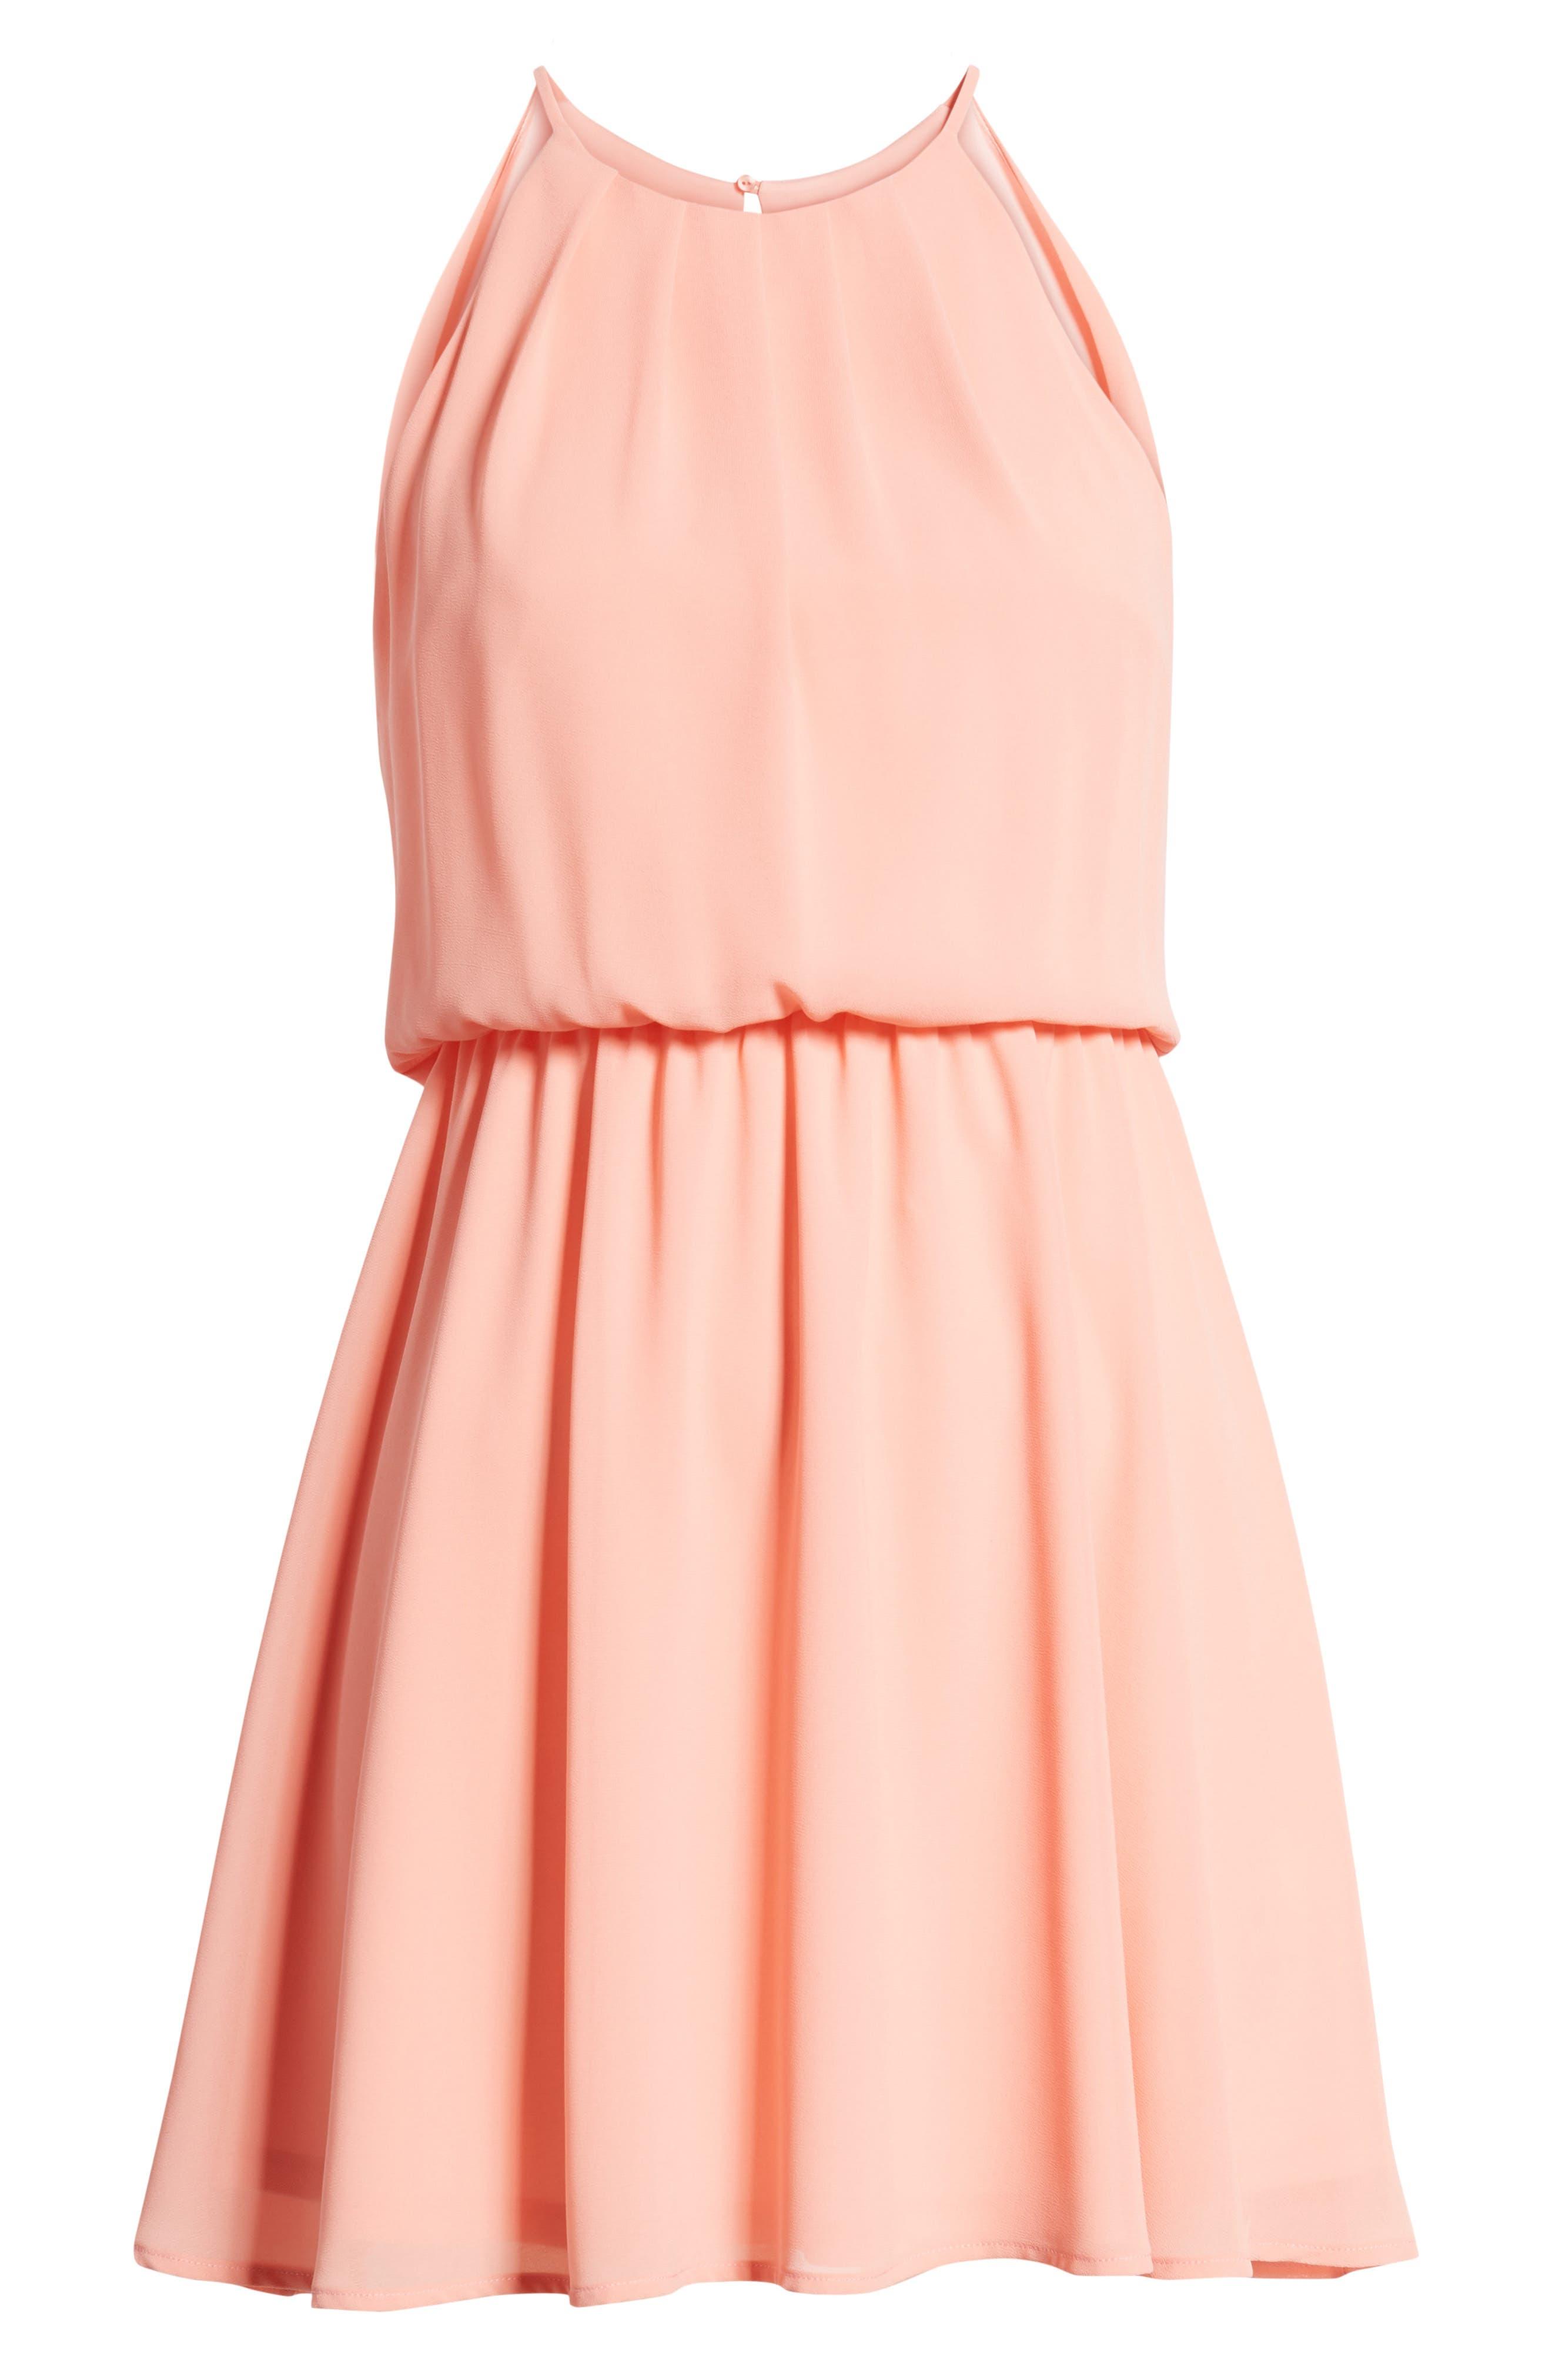 Blouson Chiffon Skater Dress,                             Alternate thumbnail 3, color,                             Peach